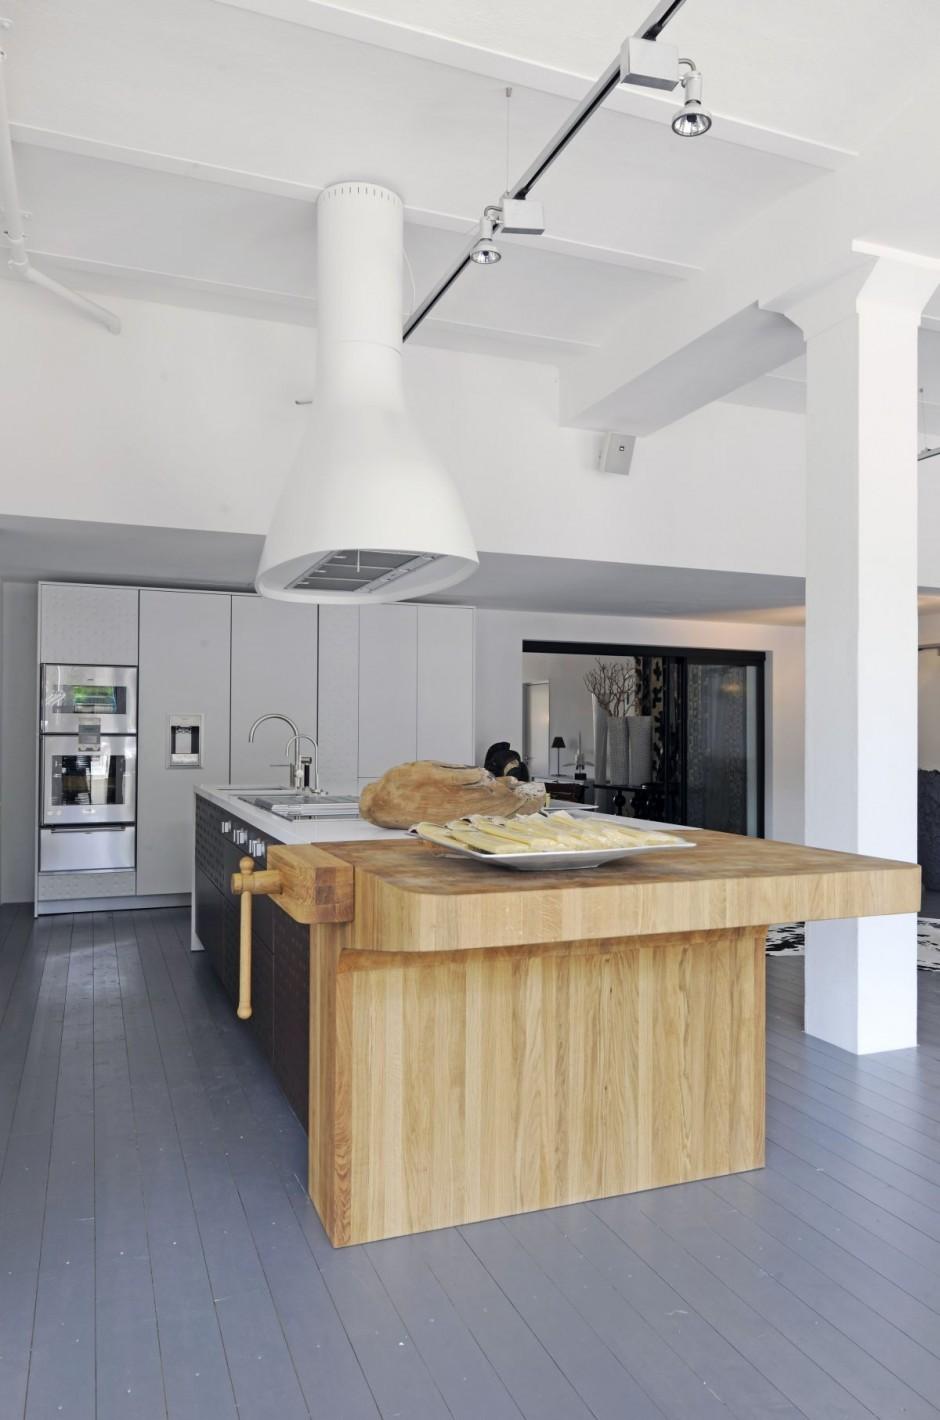 Daniel paya dise o de interiores arquitectura y for Kitchen design york pa